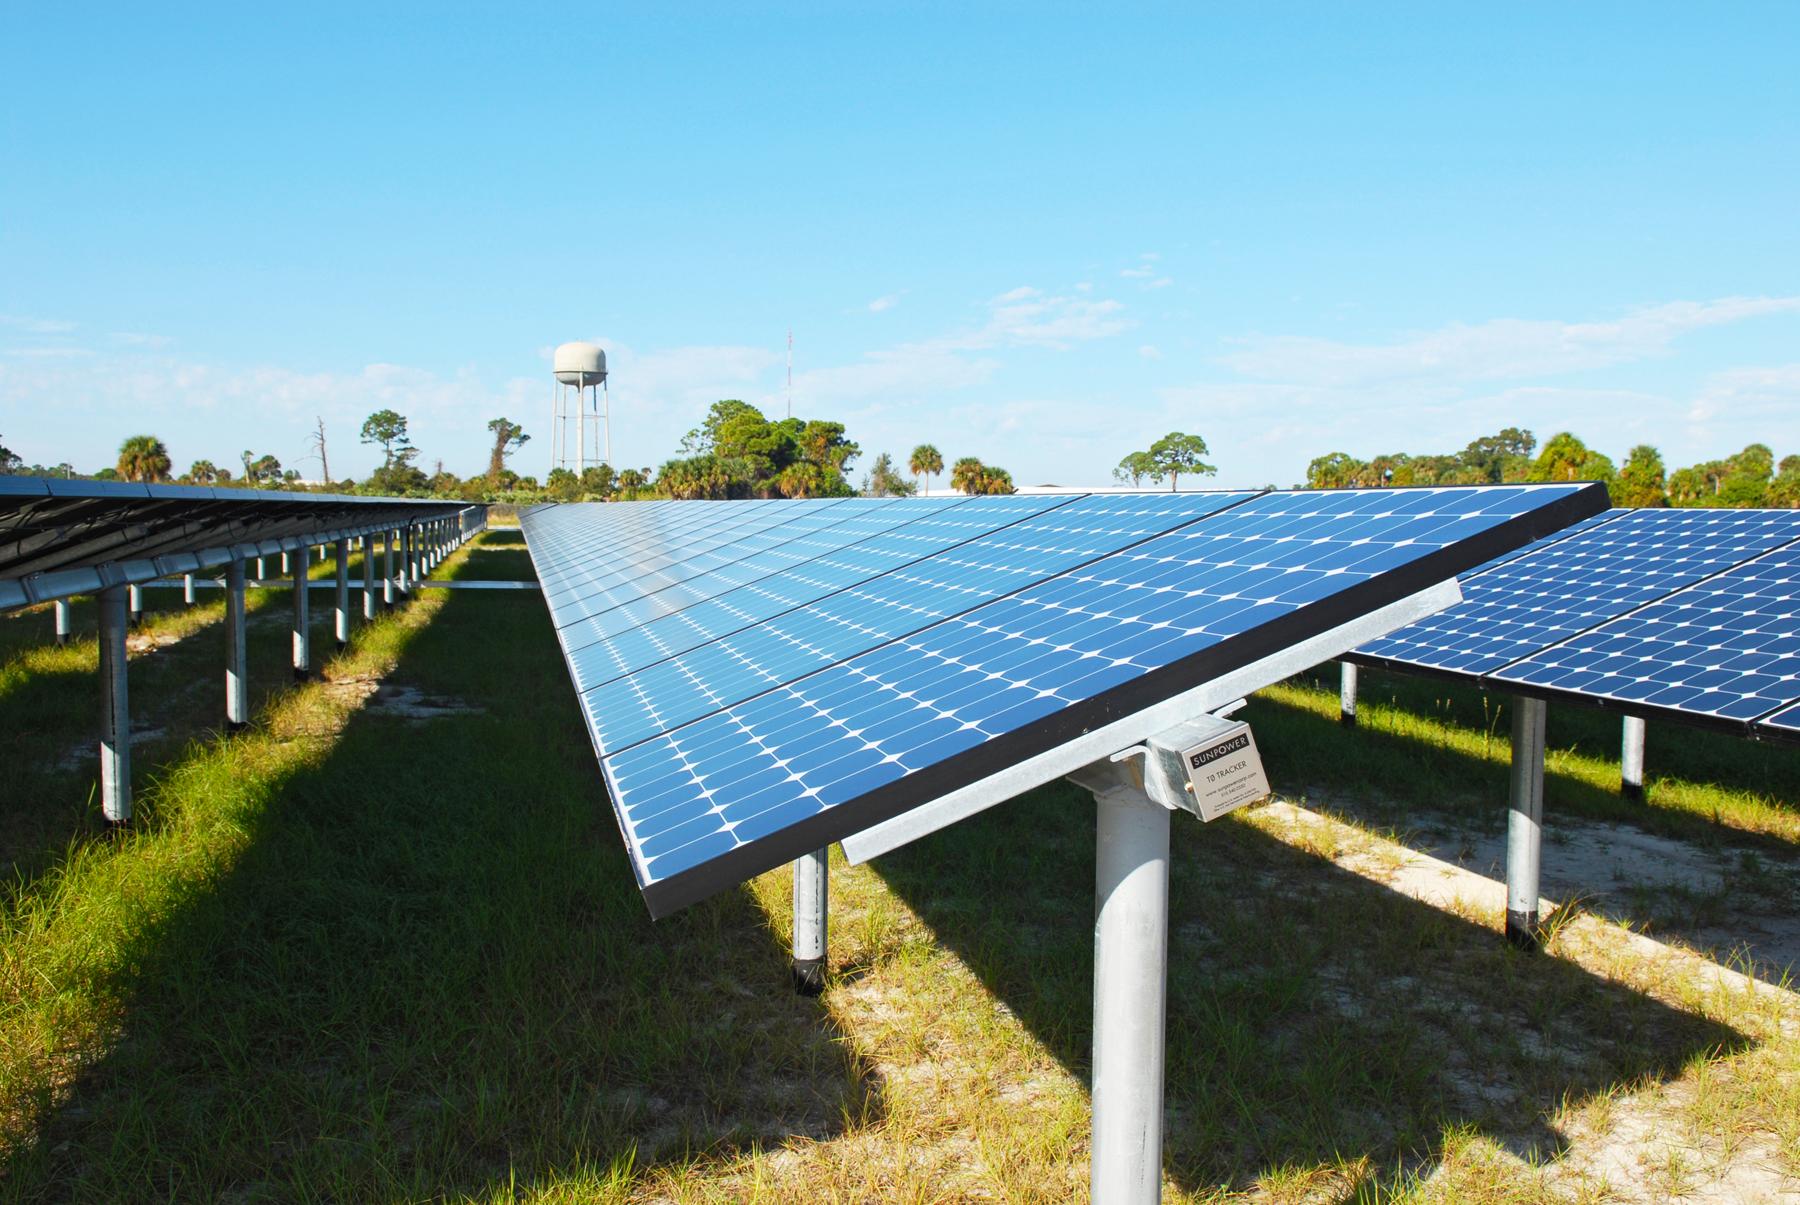 nasa solar panel - photo #15